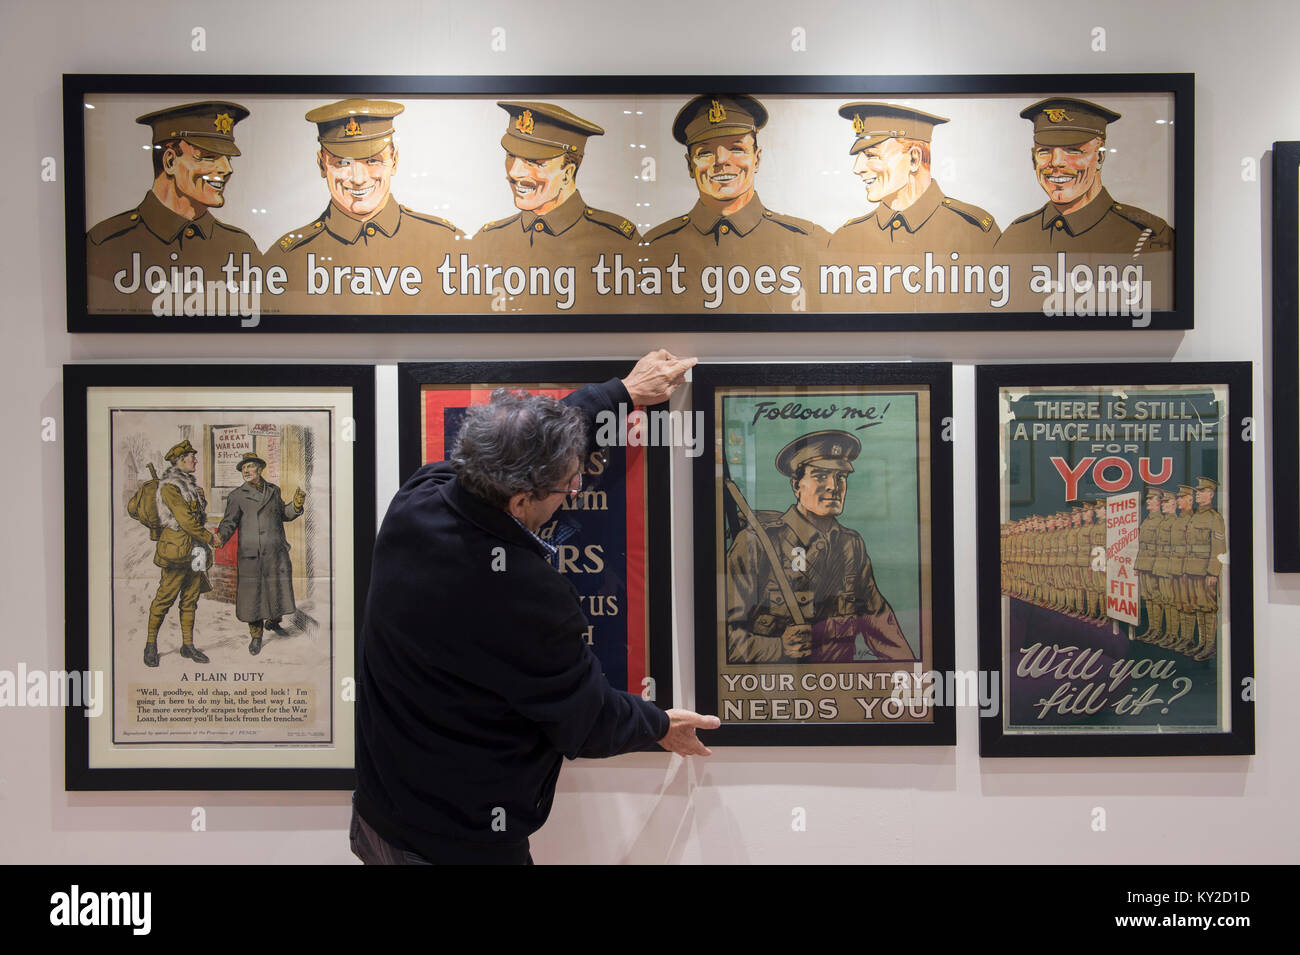 World War 1 Posters Stock Photos & World War 1 Posters Stock